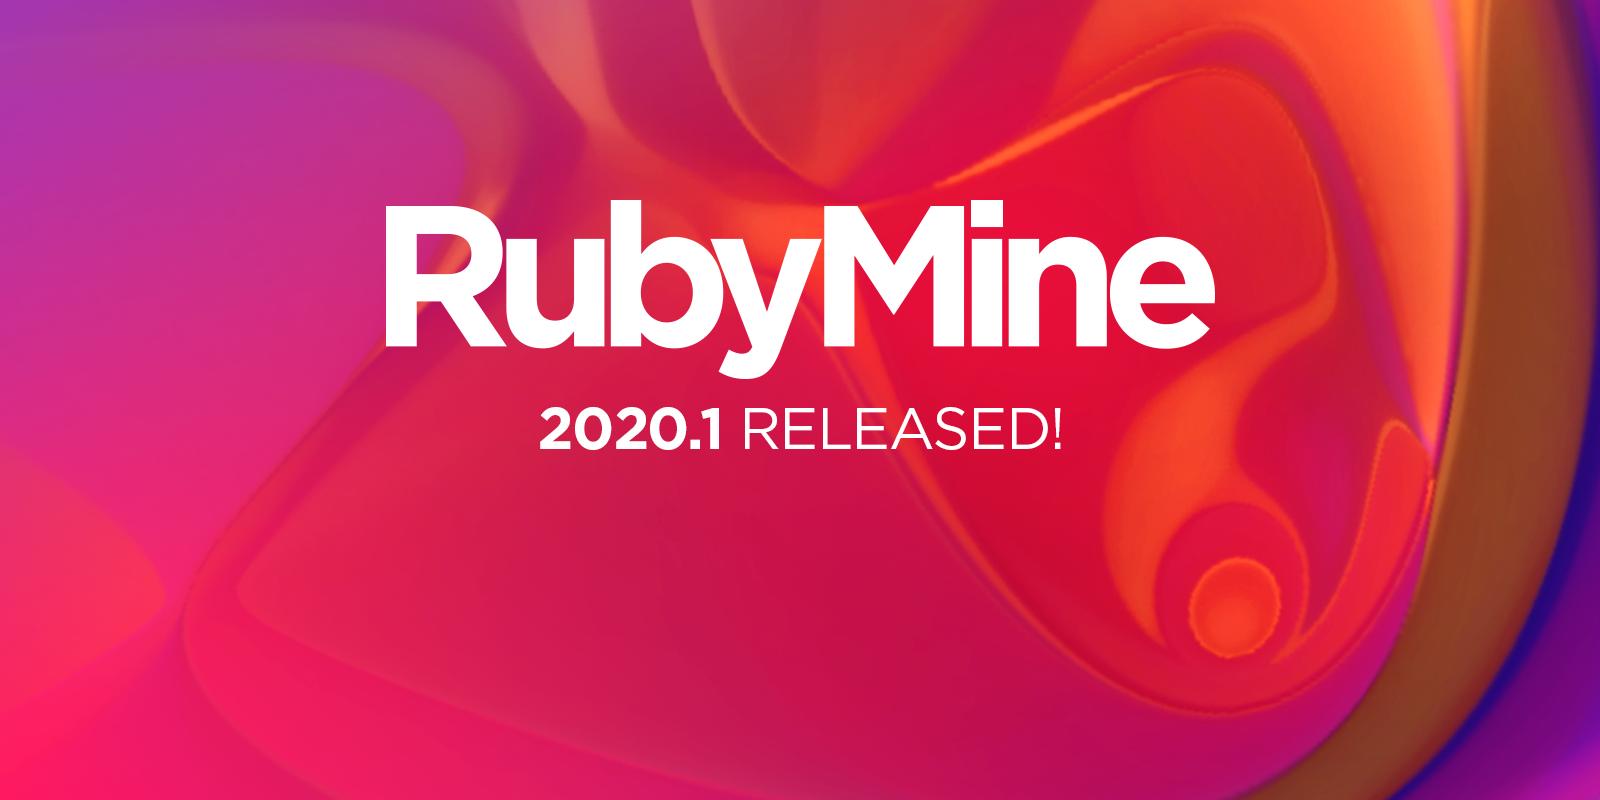 RubyMine 2020.1 est disponible